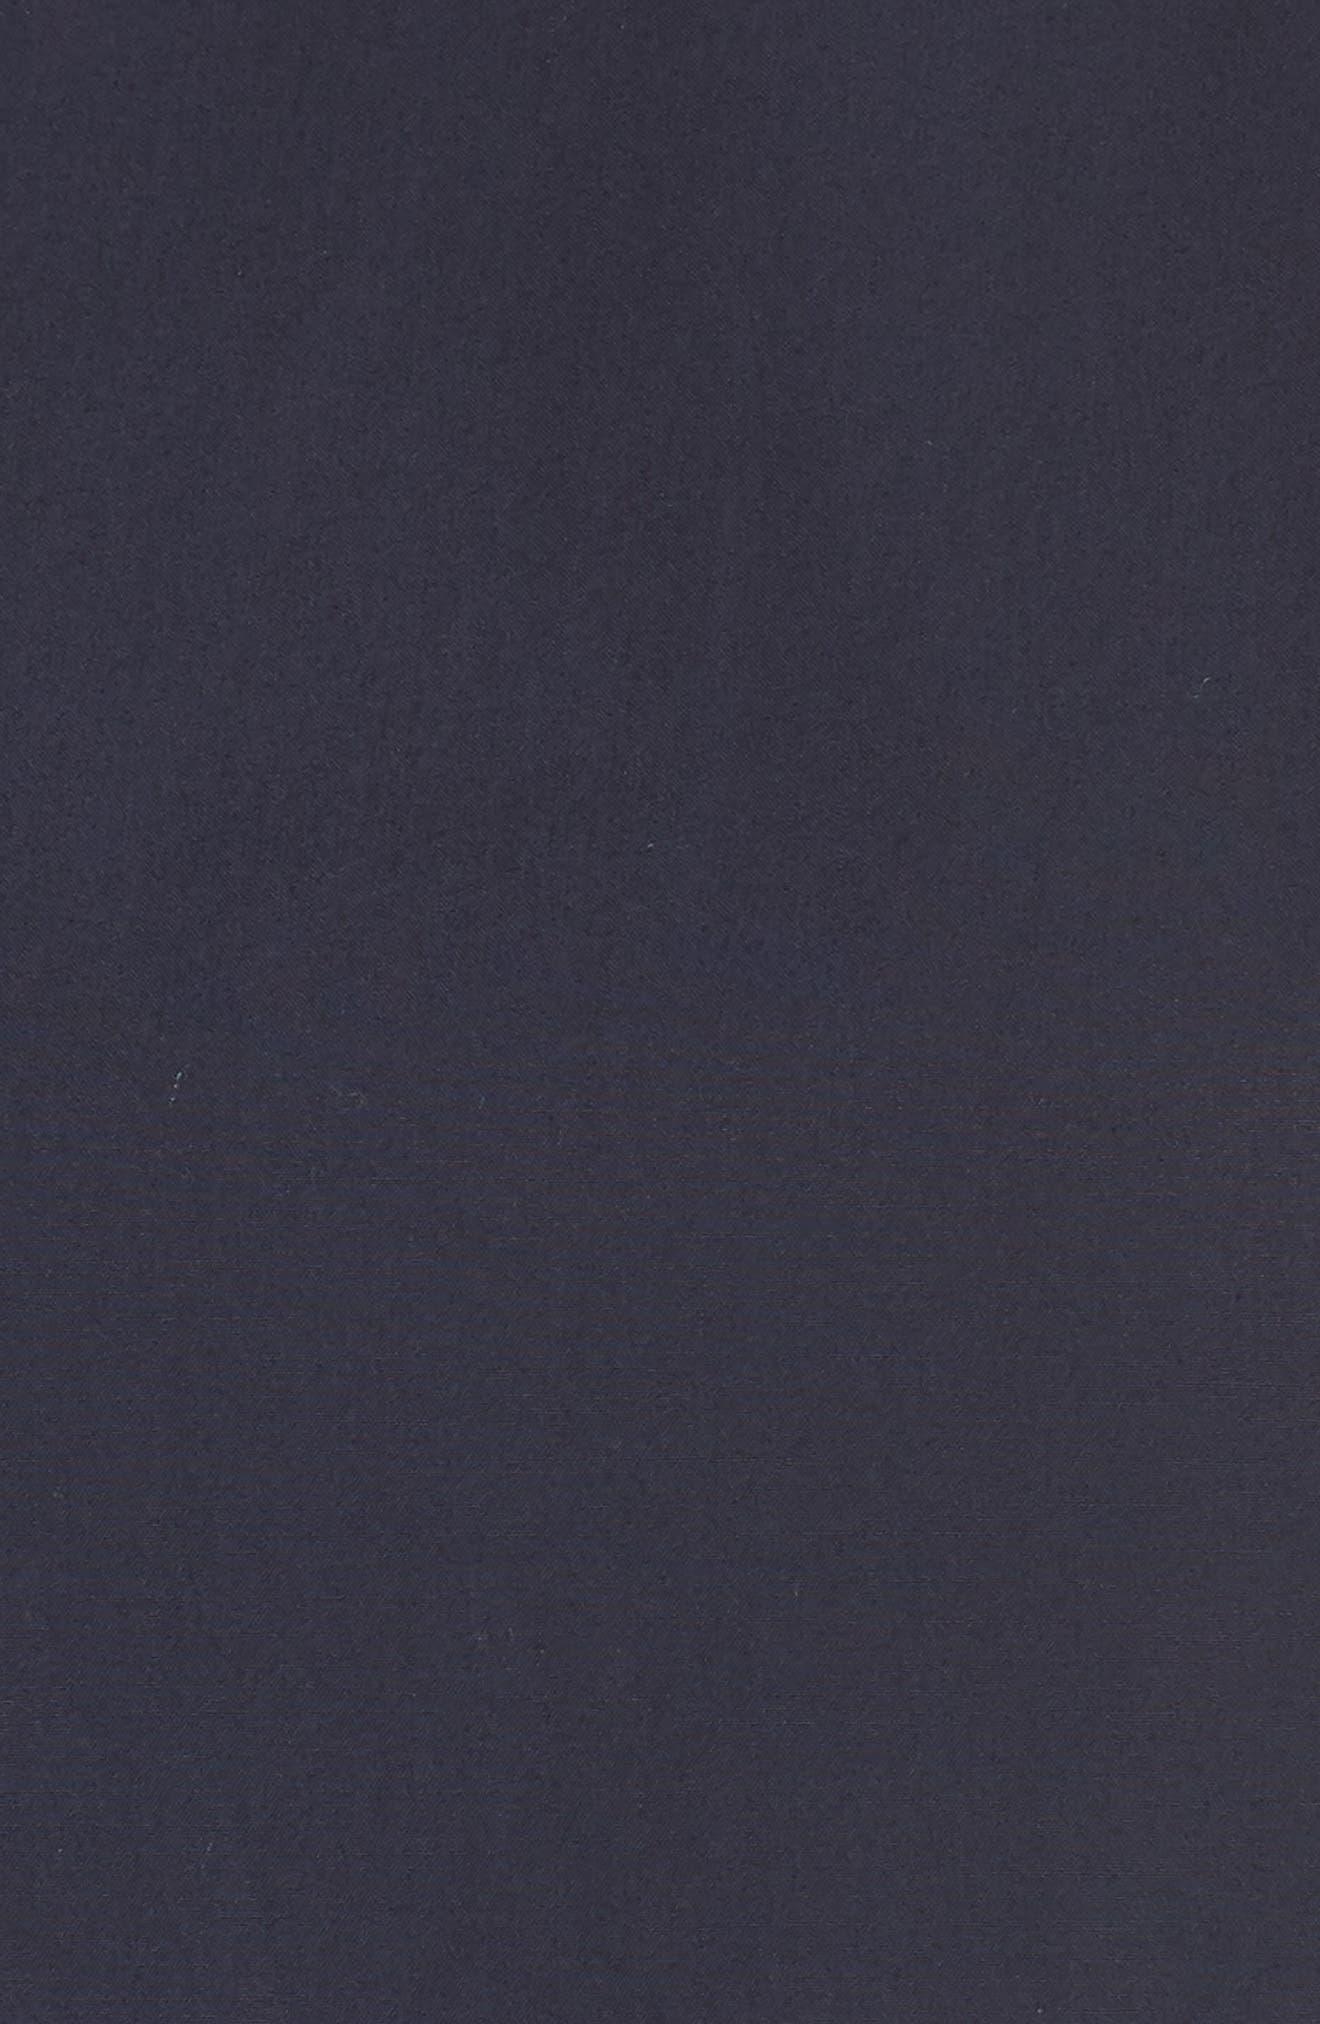 Two-Tone Tie Waist Sheath Dress,                             Alternate thumbnail 6, color,                             401